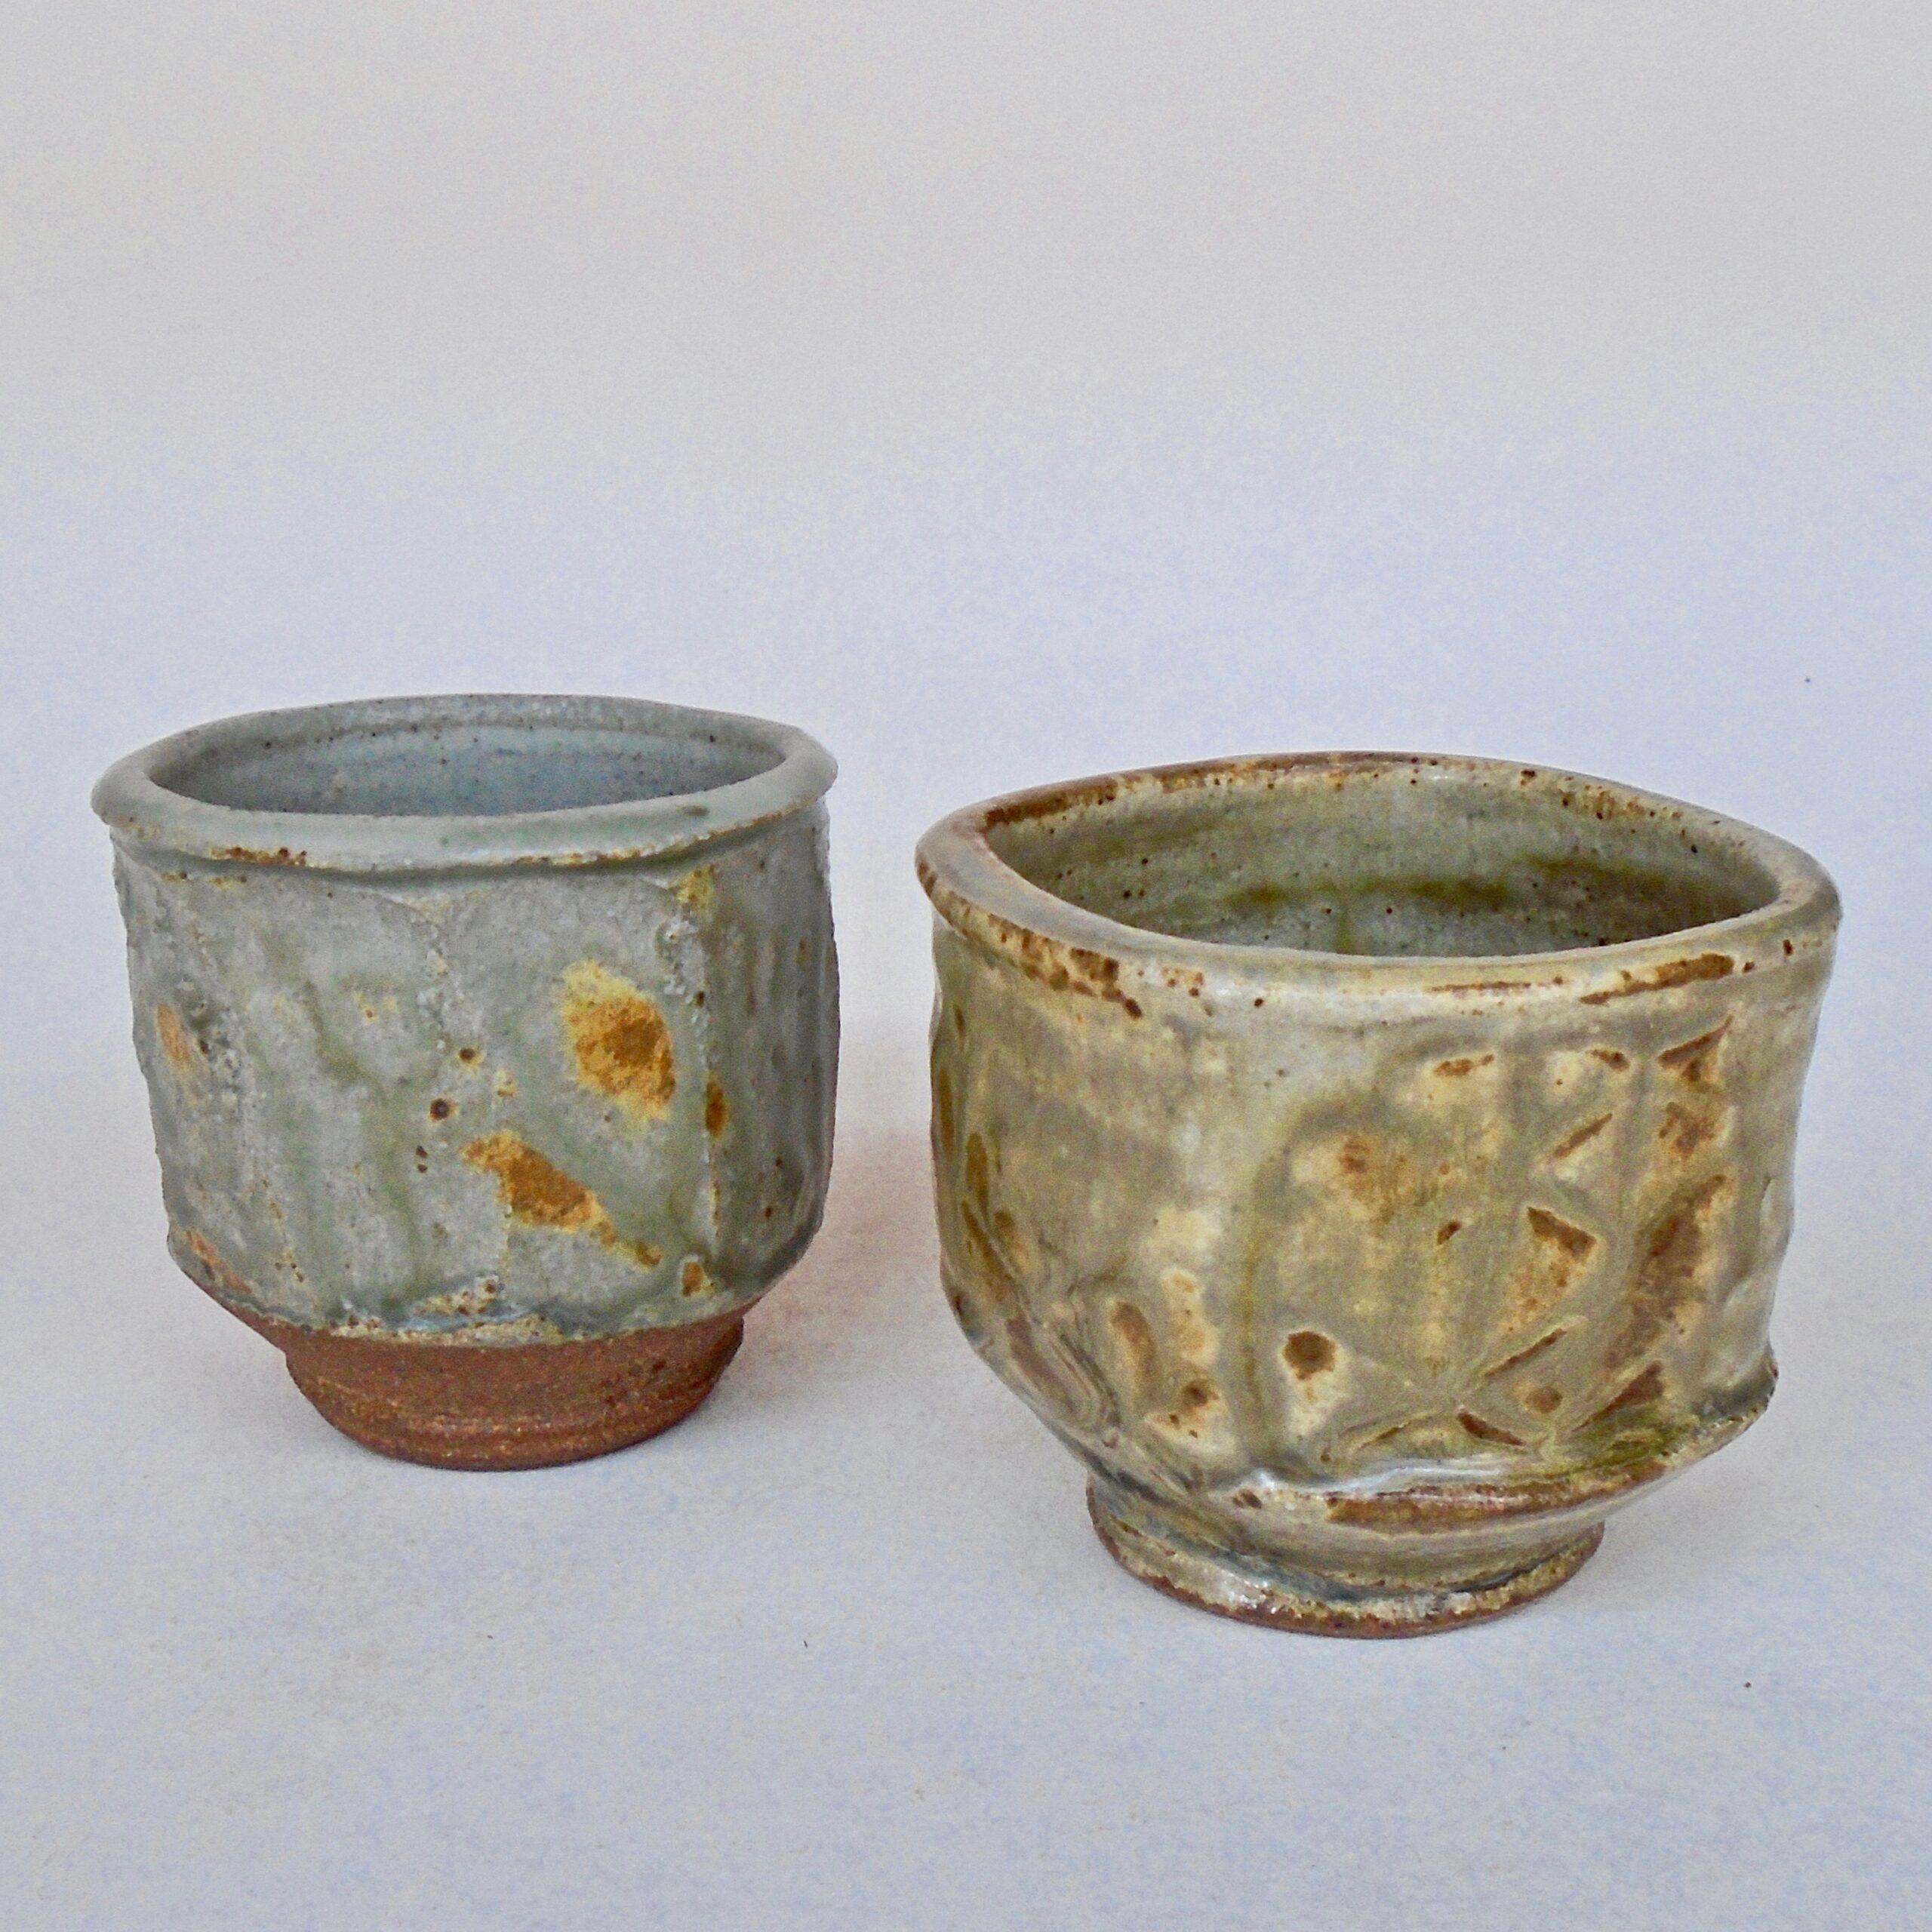 JL236: Set of Ashy Cups